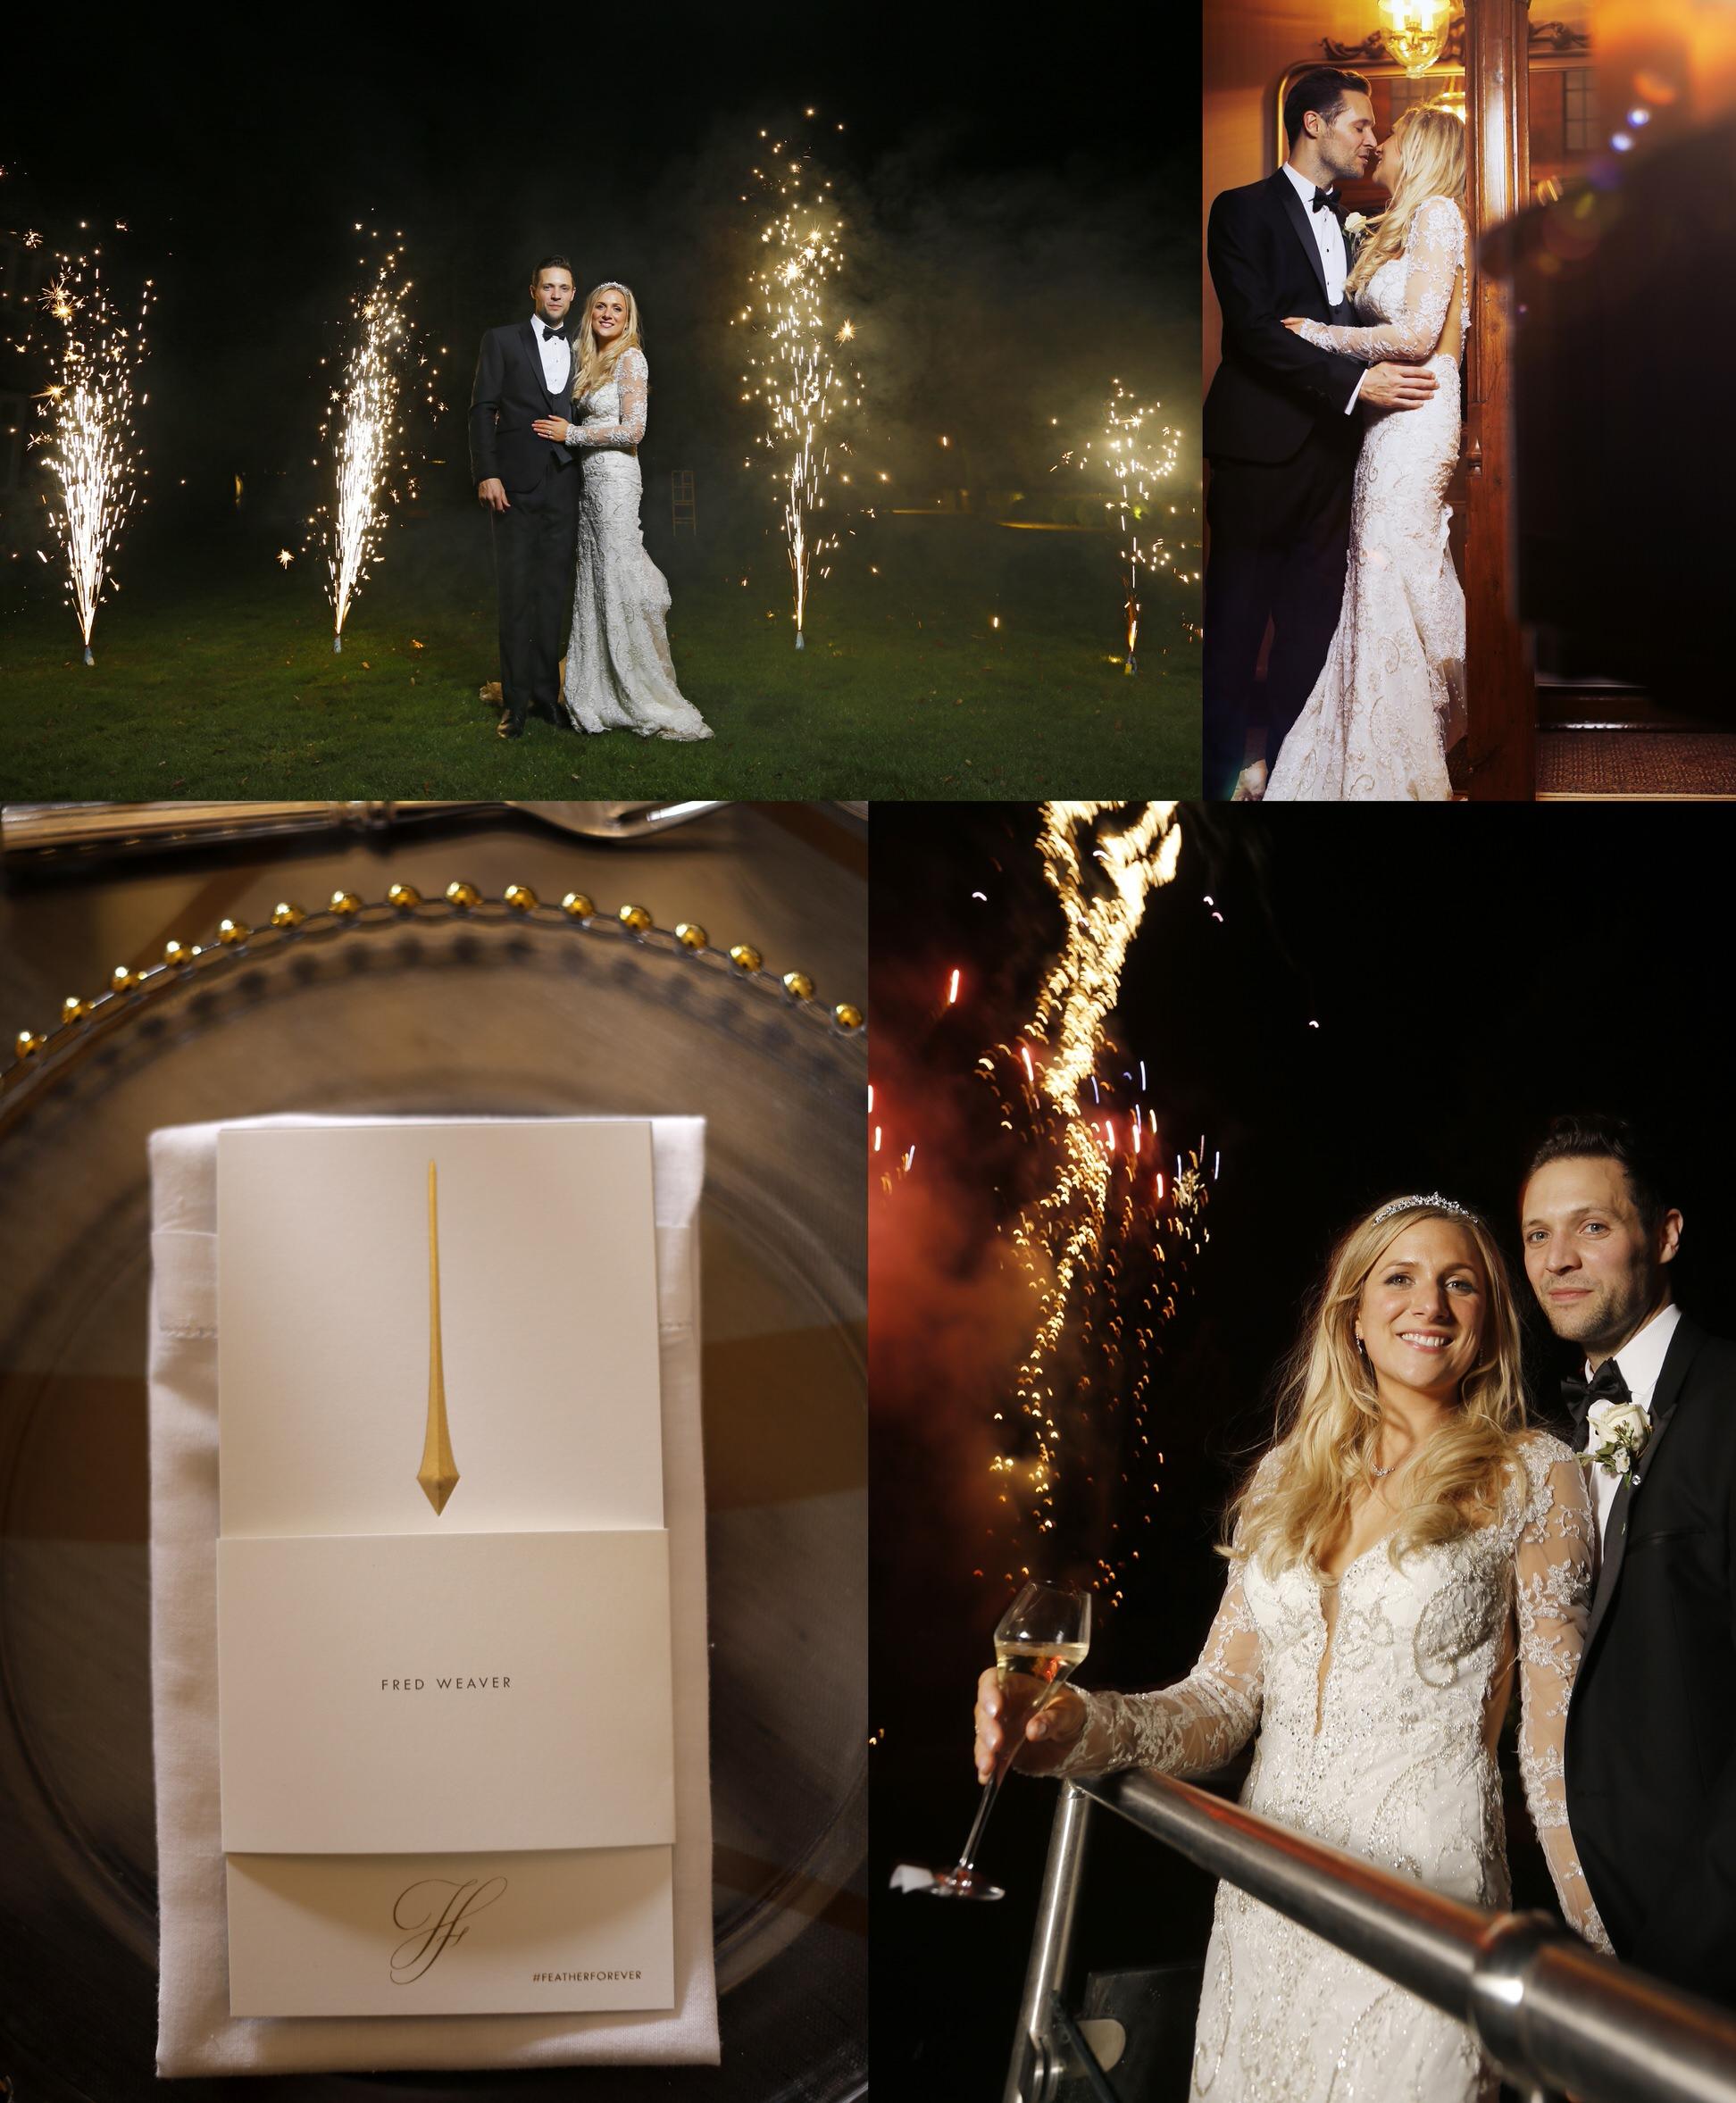 brett-harkness-winter-wedding-uk-wedding-photographer_0022.jpg